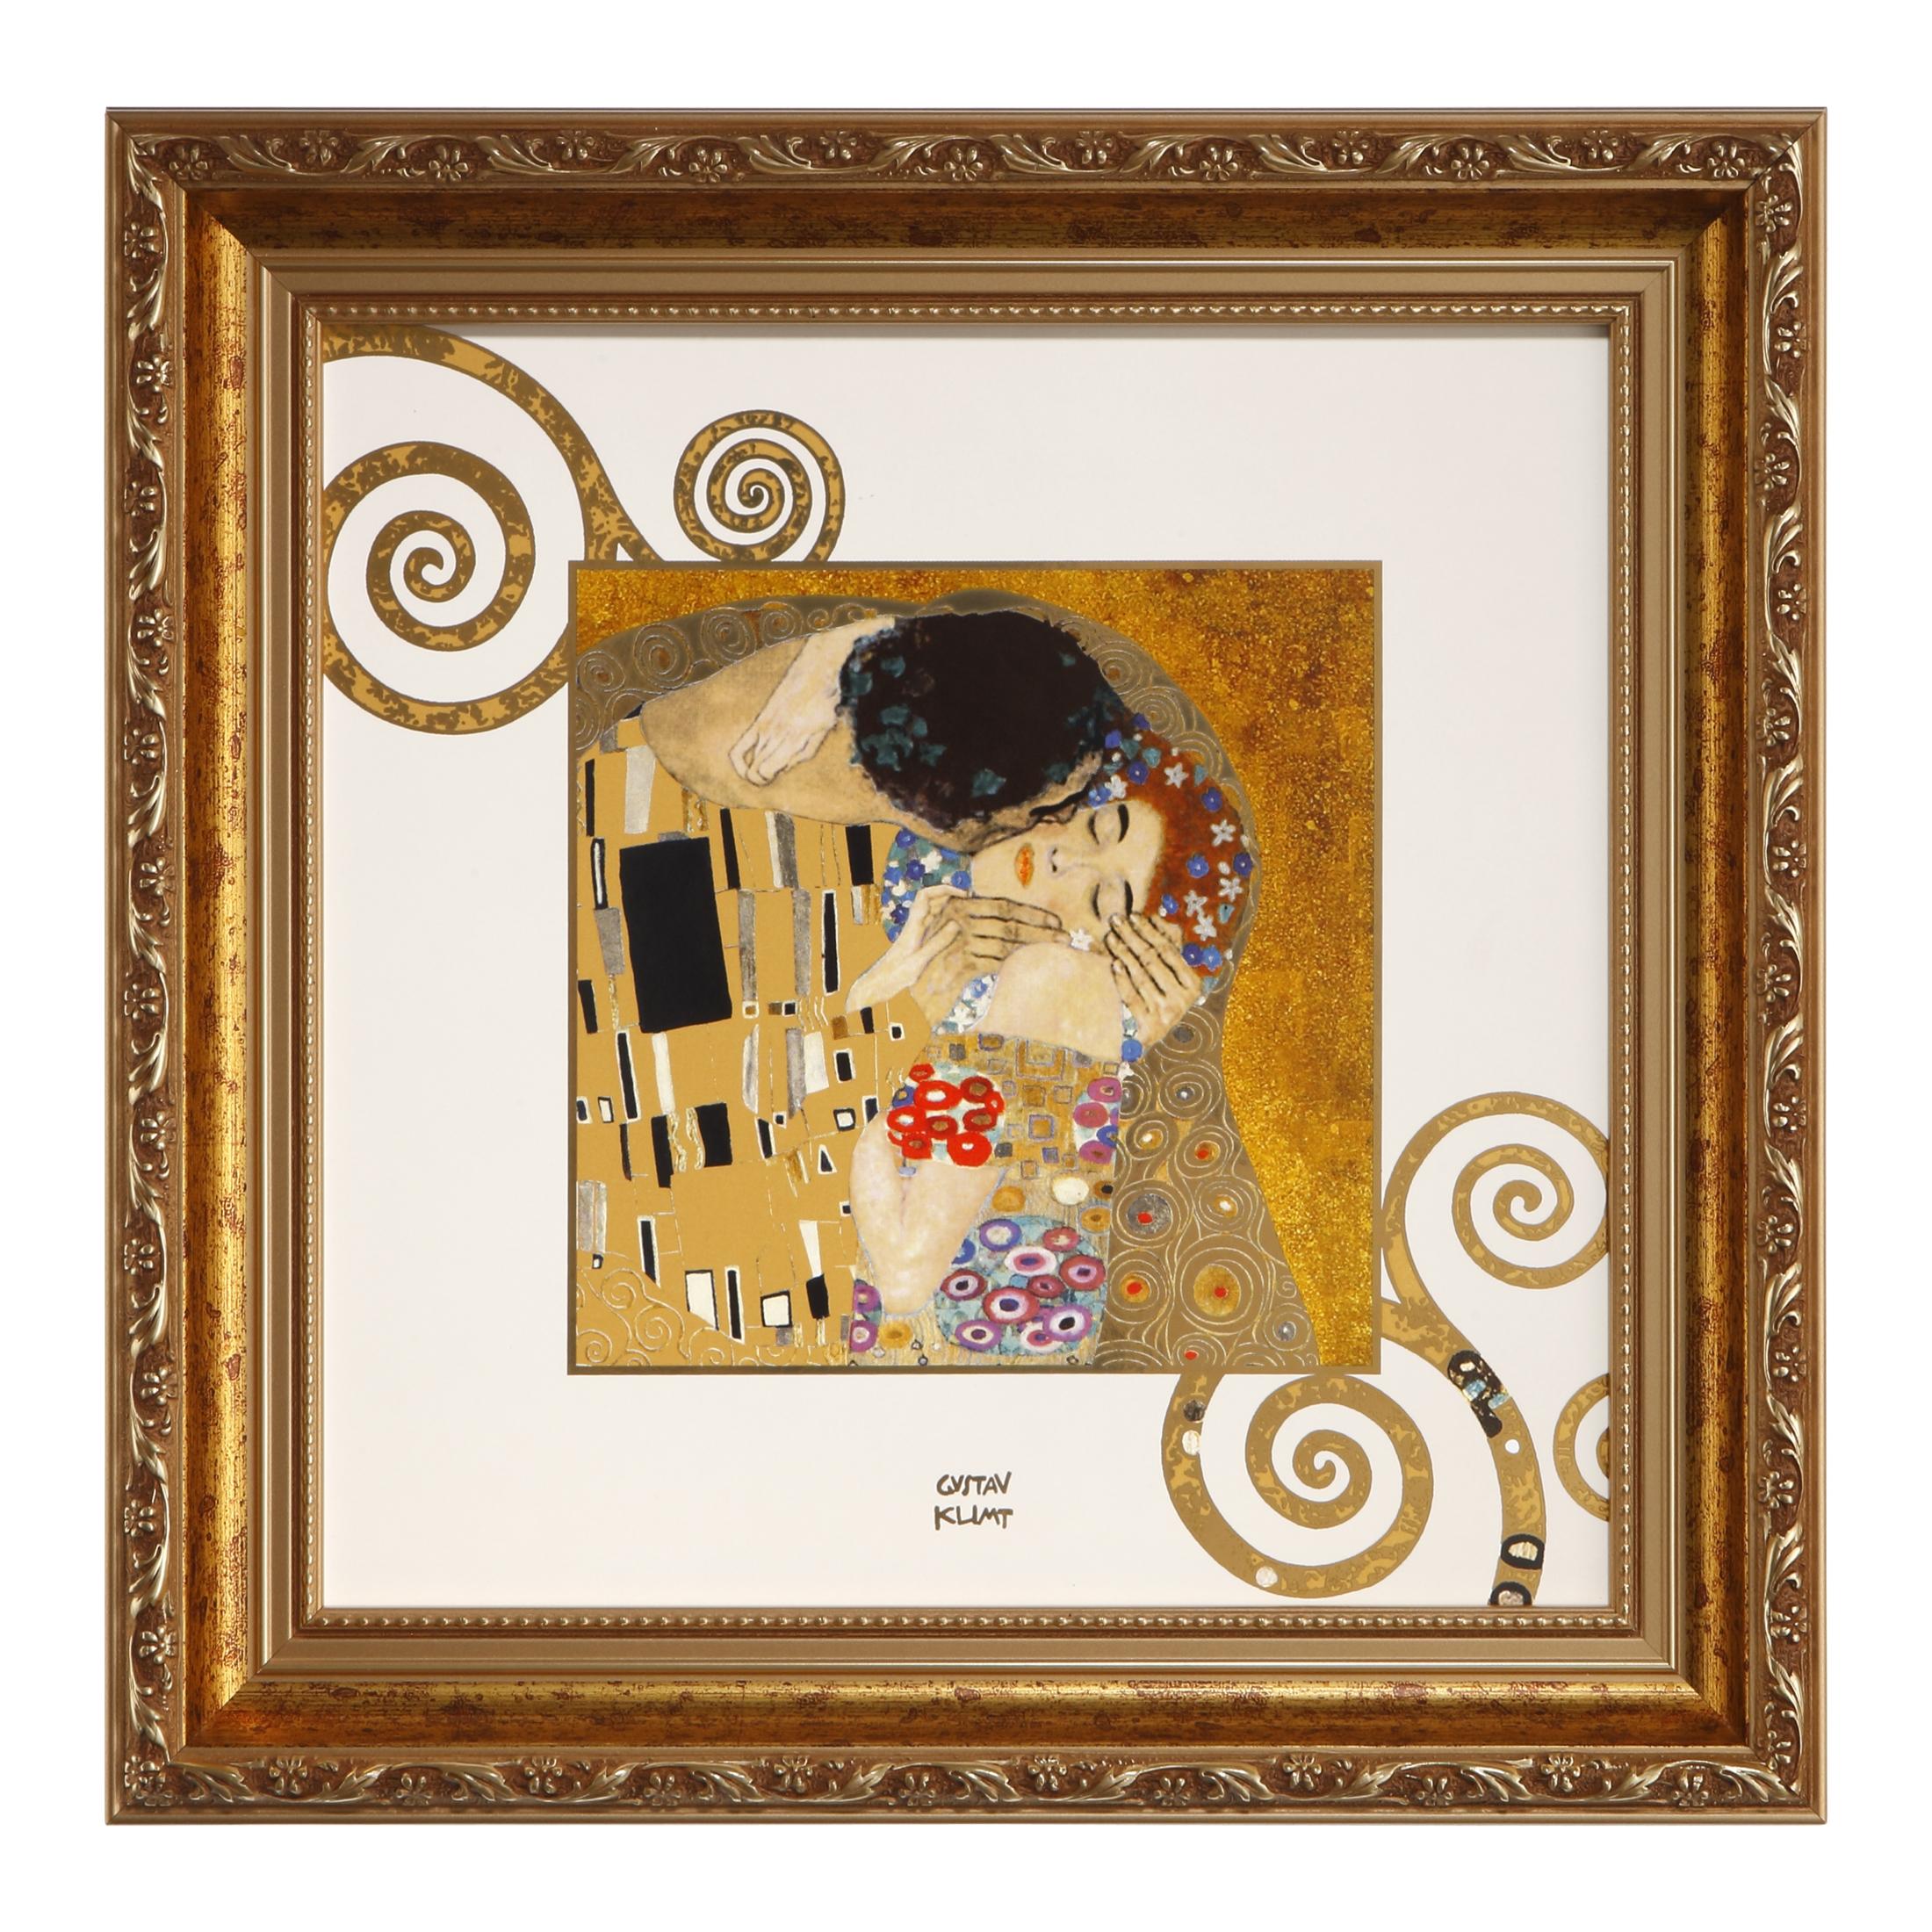 Goebel Artis Orbis Gustav Klimt 'AO P BI Der Kuss' 2021